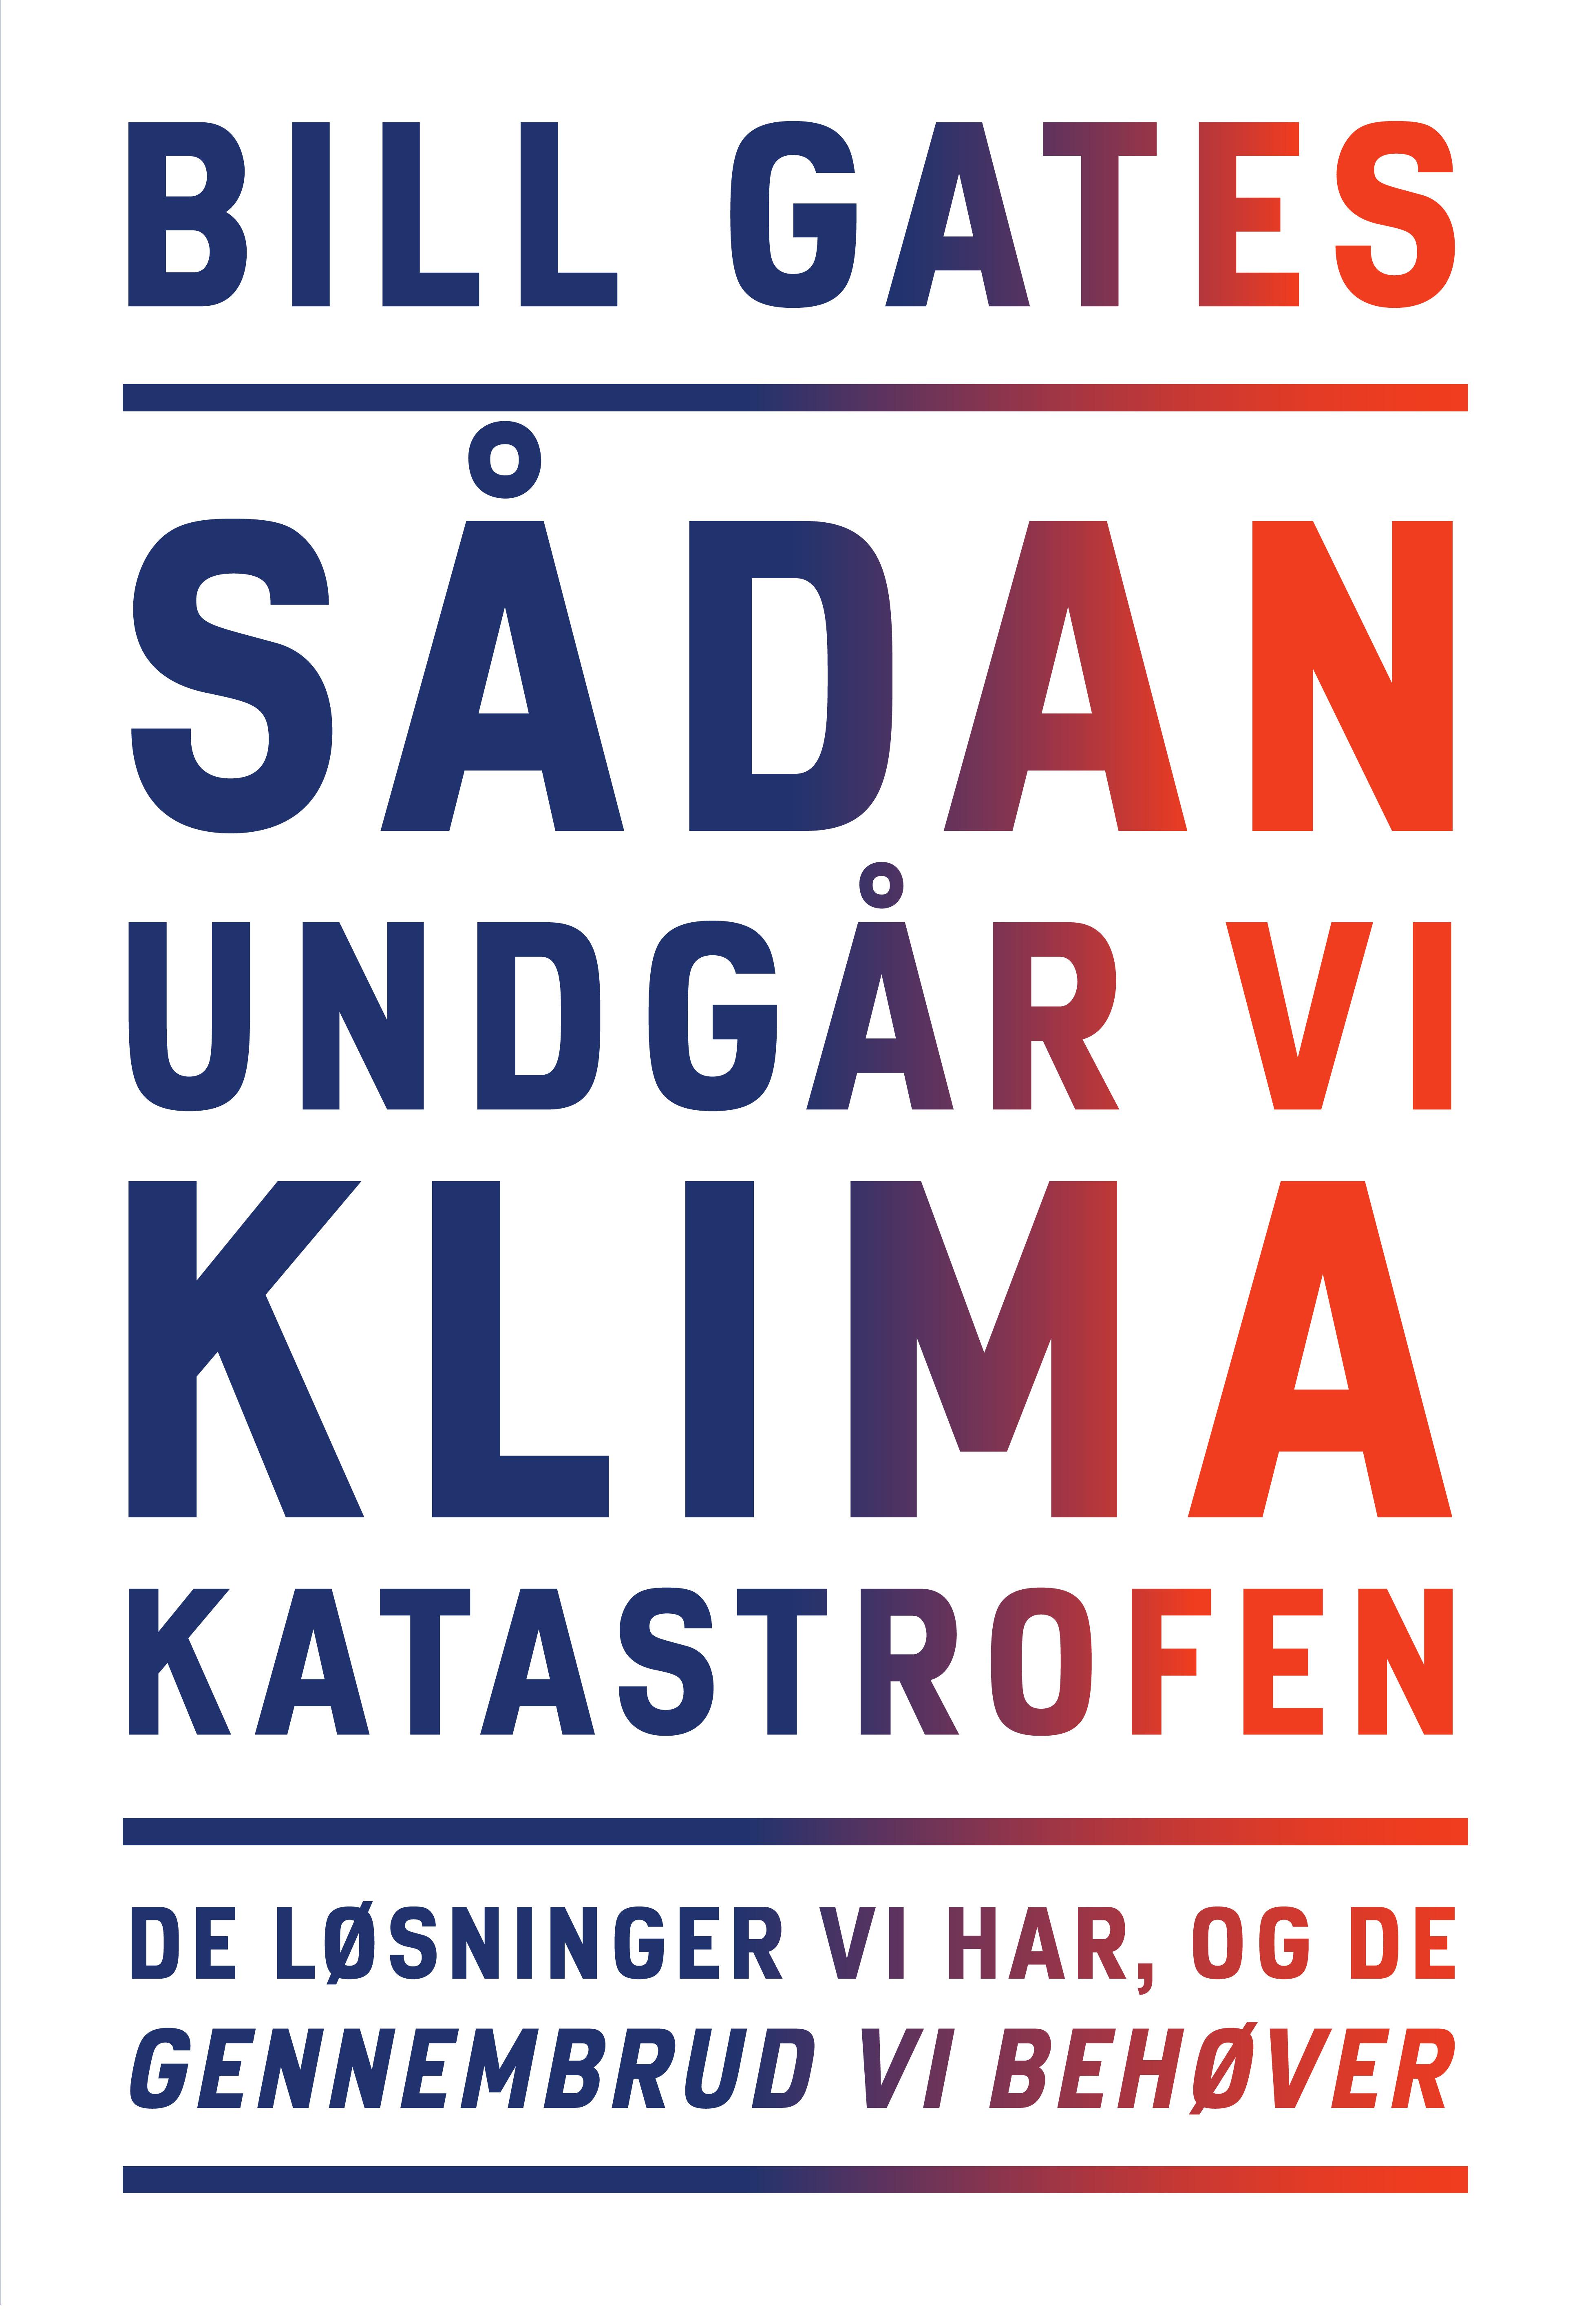 Sådan undgår vi klimakatastrofen - Bill Gates - Bøger - Gyldendal - 9788702299601 - February 16, 2021